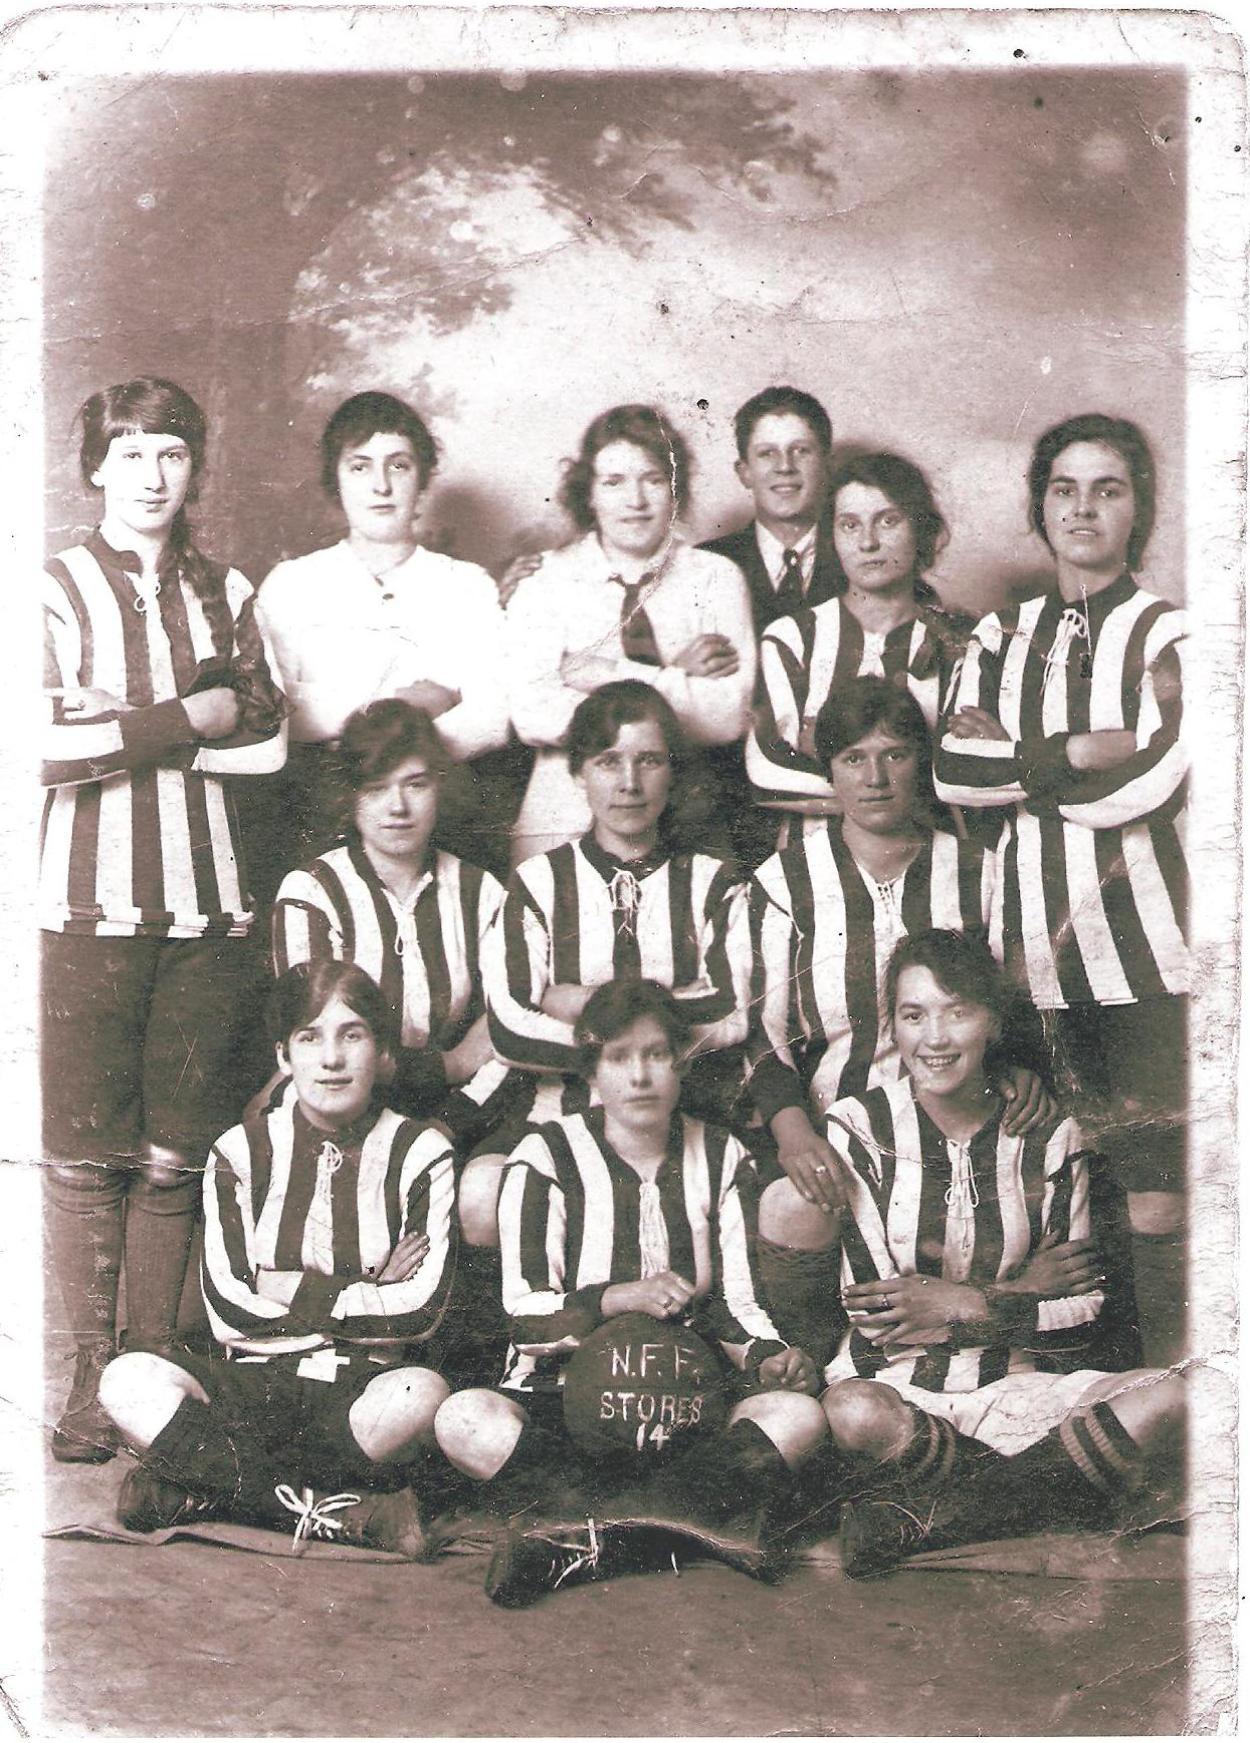 footballing munitionettes